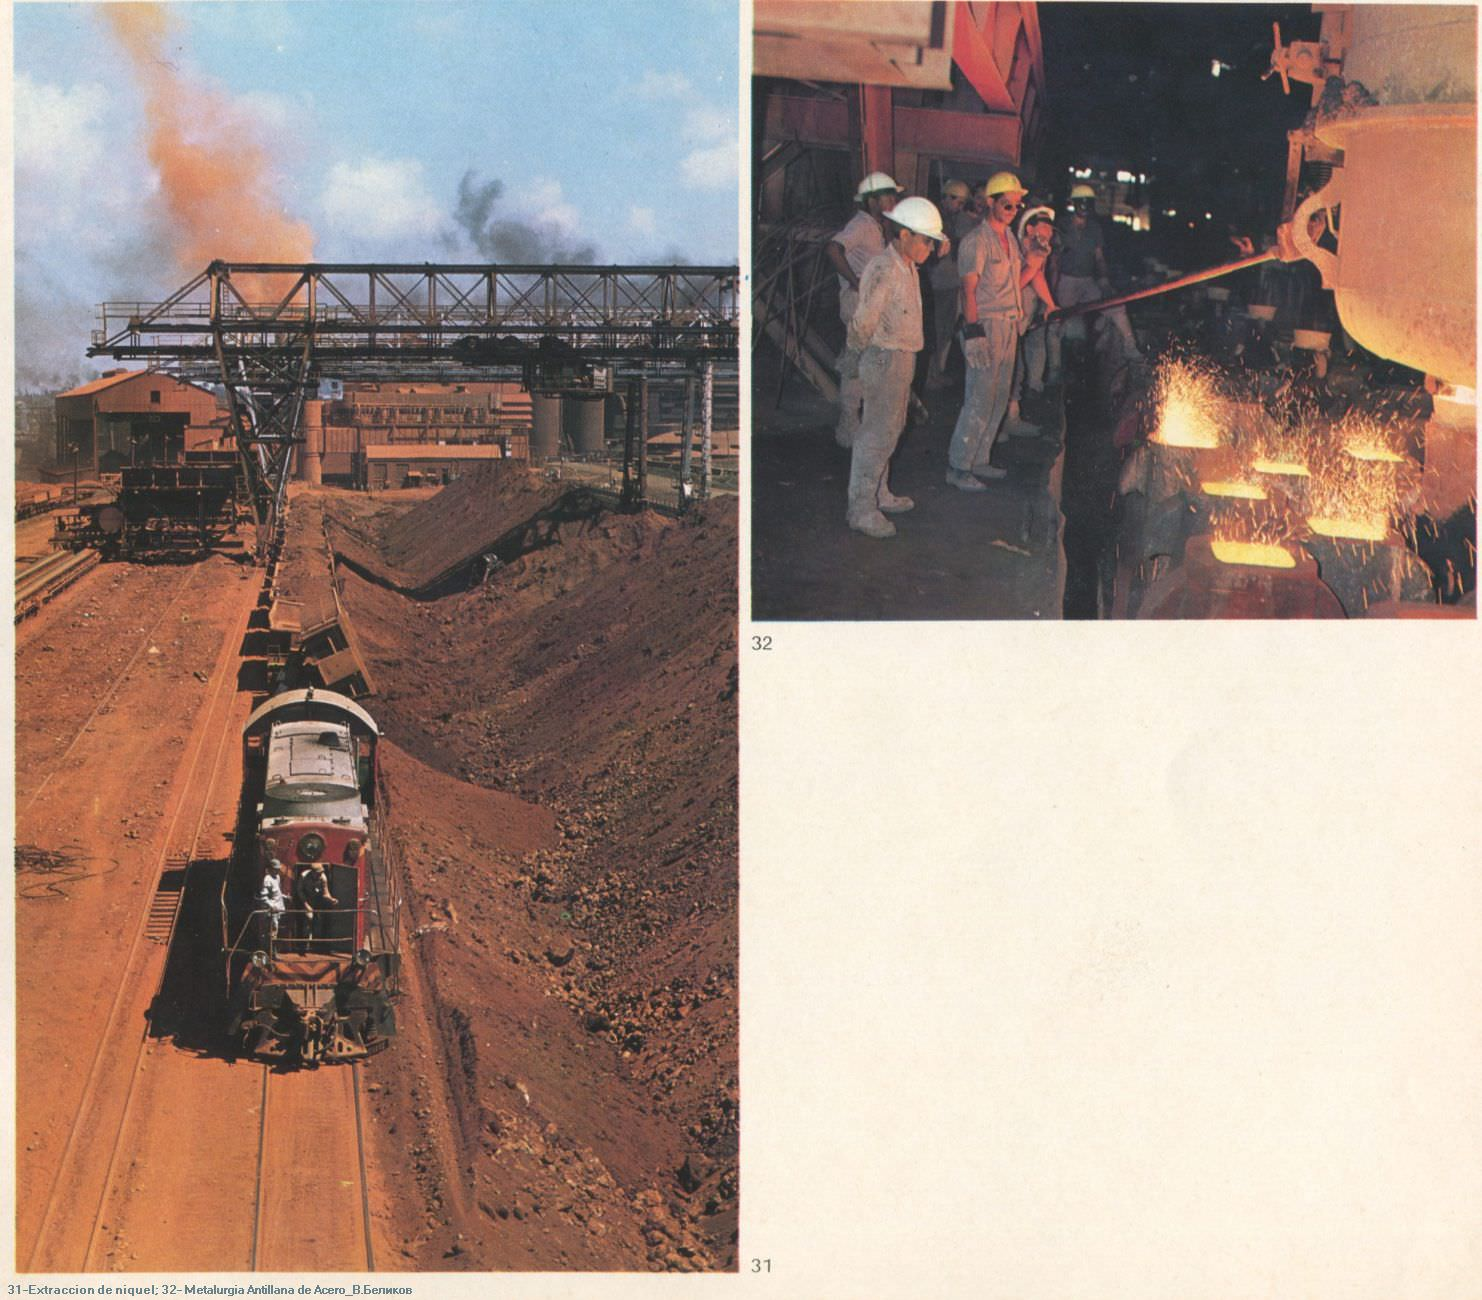 031. Extraccion de niquel; 032. Metalurgia Antillana de Acero.